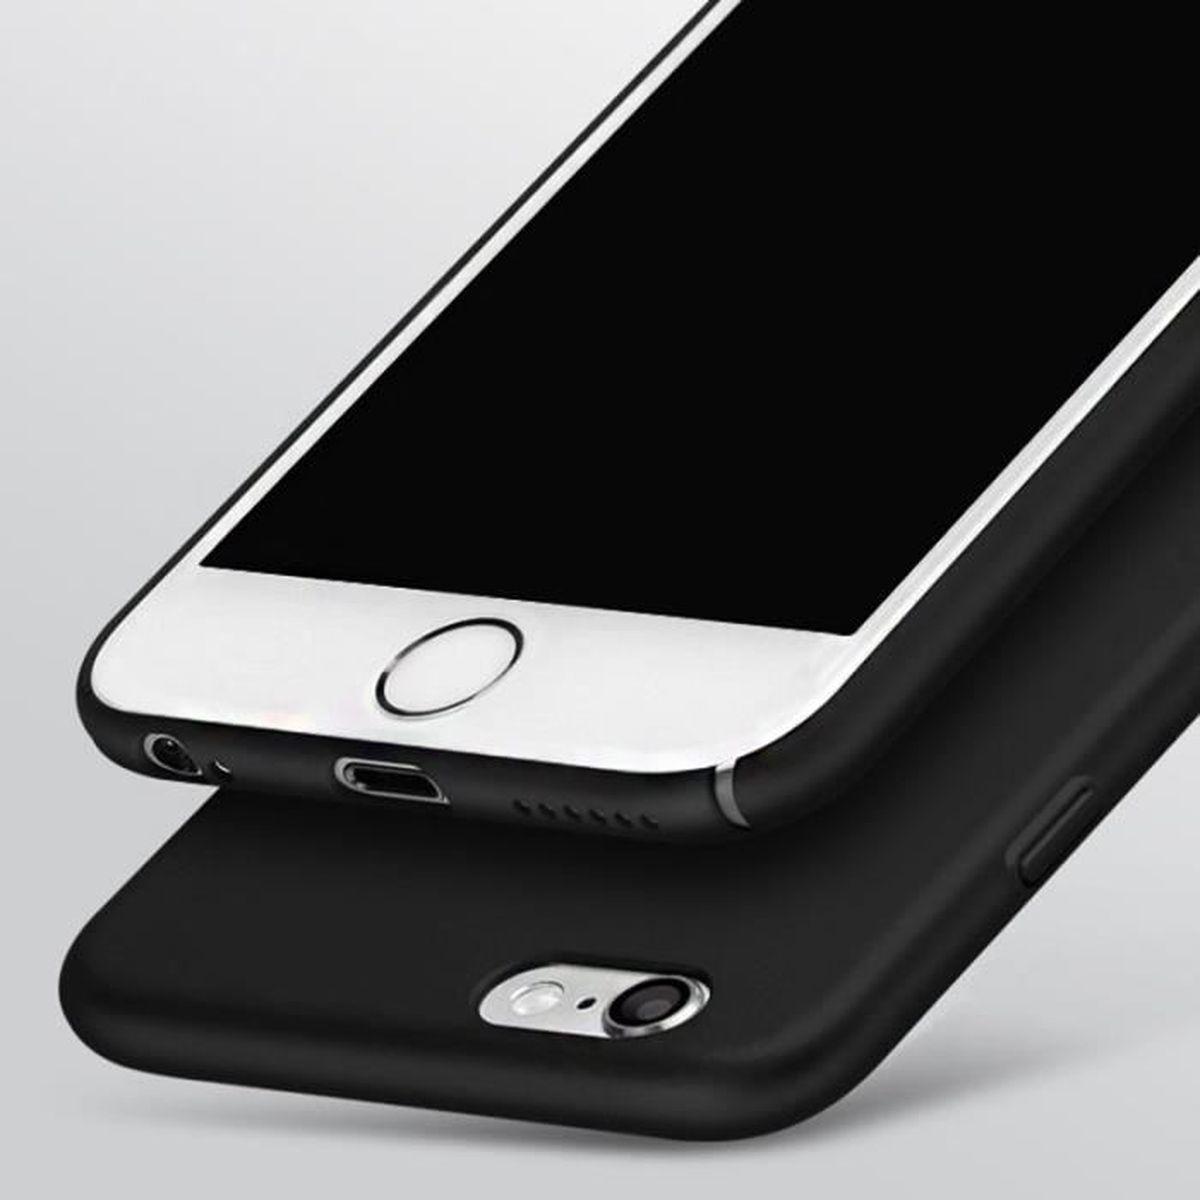 cabling r coque iphone 6 6s plus noir mat